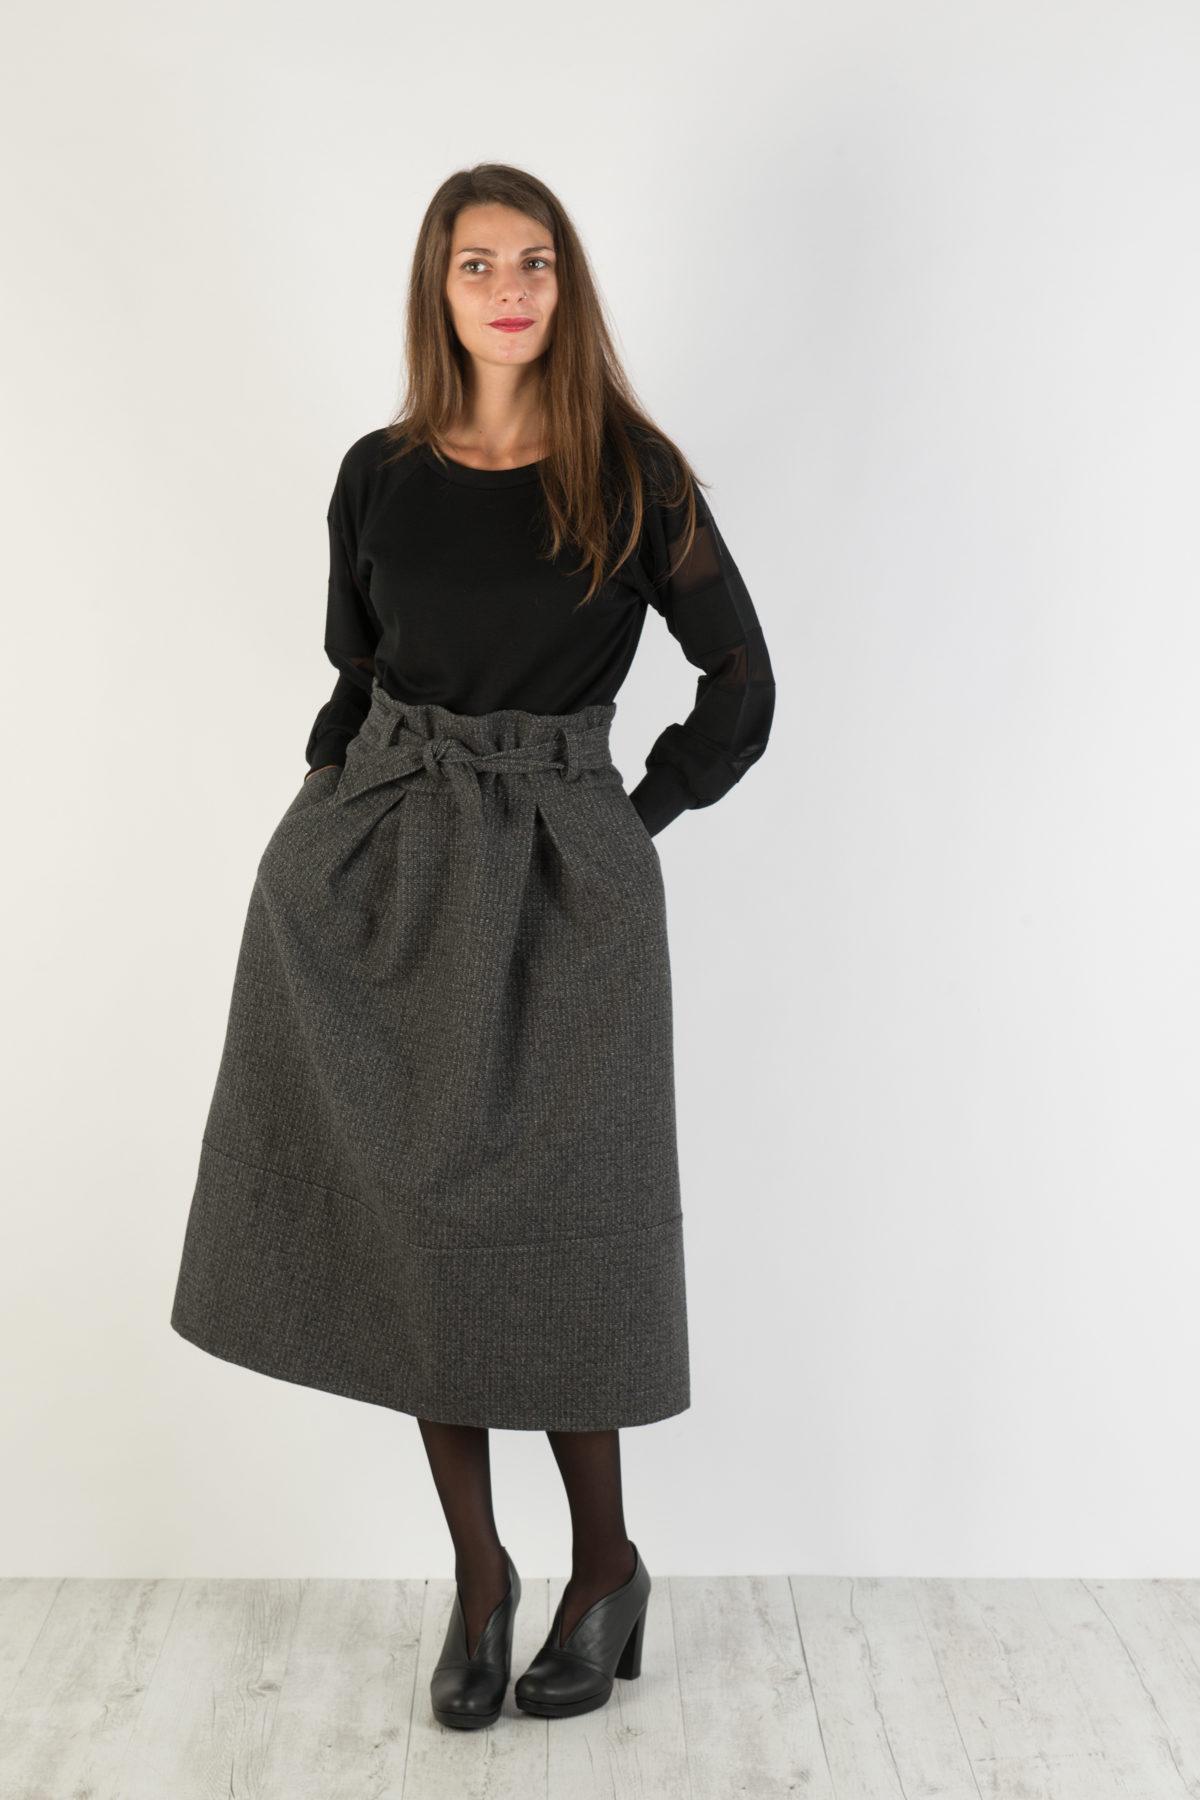 890b8b757dc119 High waisted skirt Florie gonna con maxi pinces moda FW 2017-2018